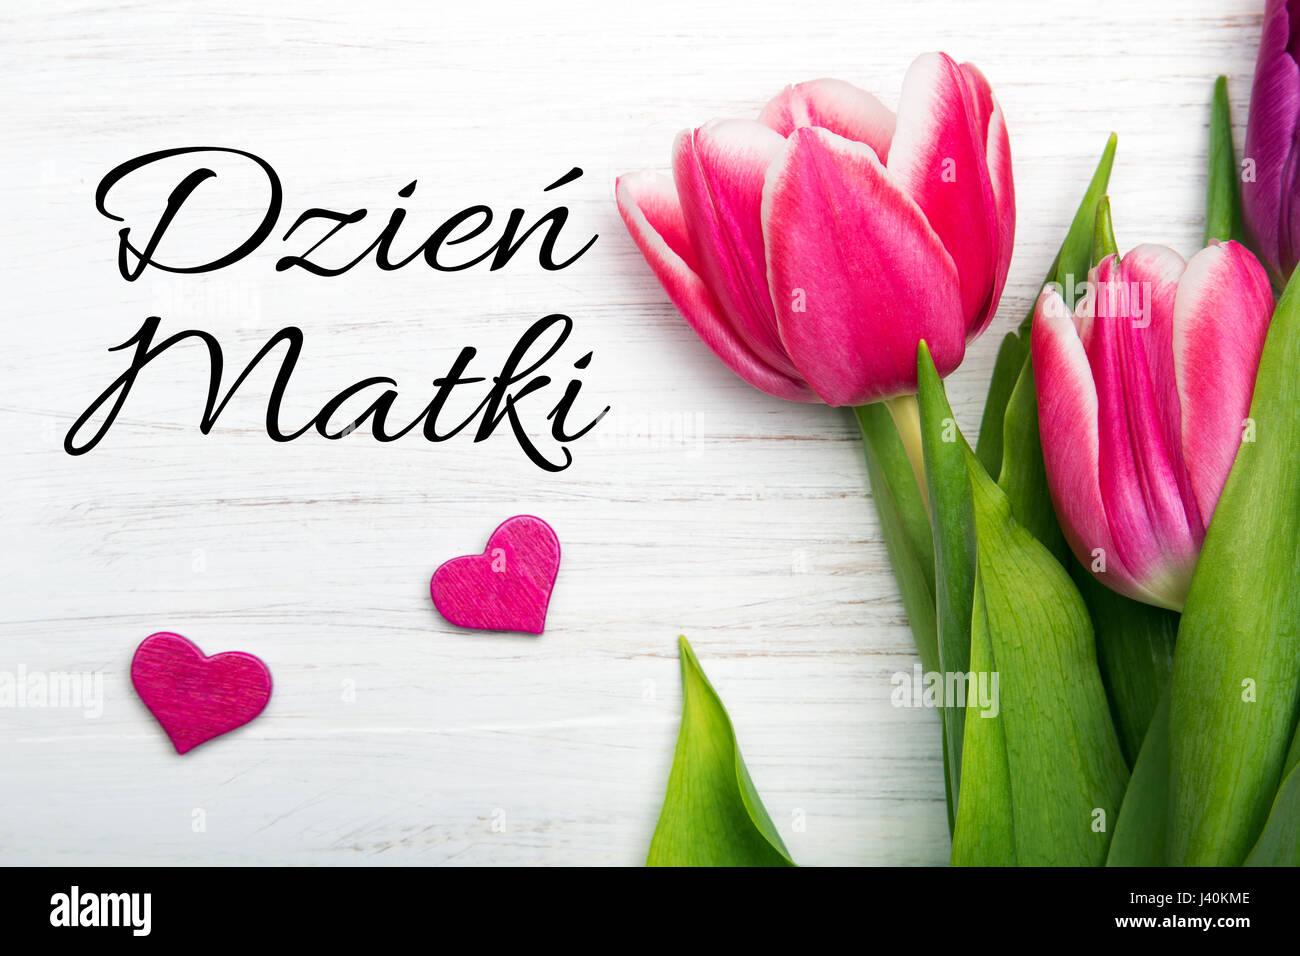 Mothers day card with polish words dzien matki mothers day mothers day card with polish words dzien matki mothers day pink tulip on white wooden background m4hsunfo